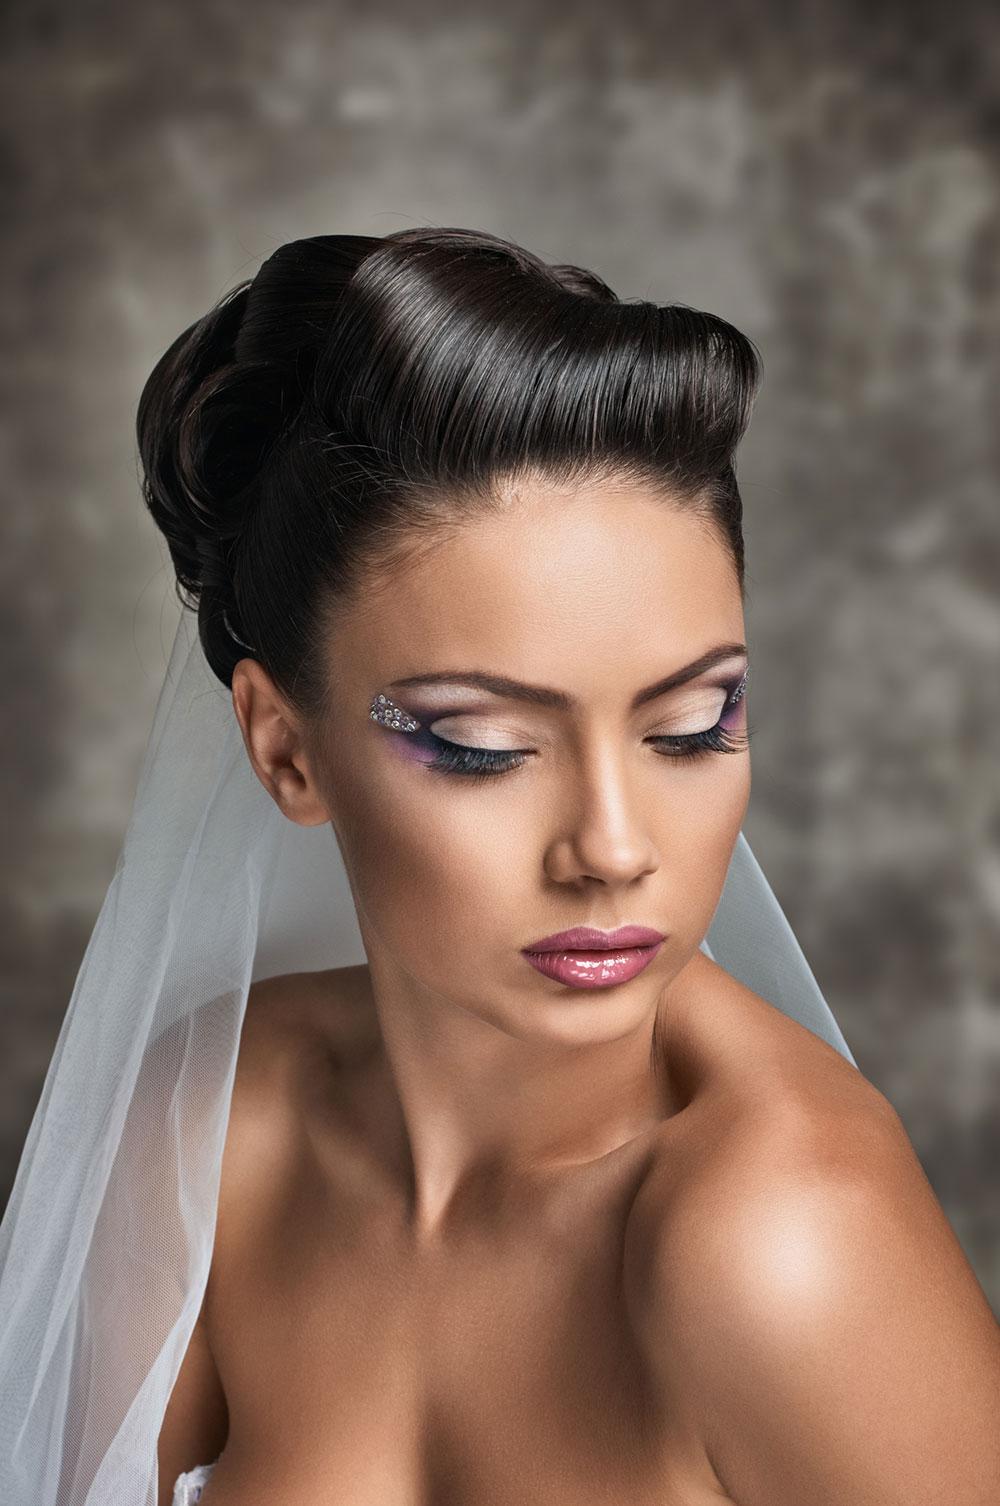 Pinned black retro updo Short hair wedding style